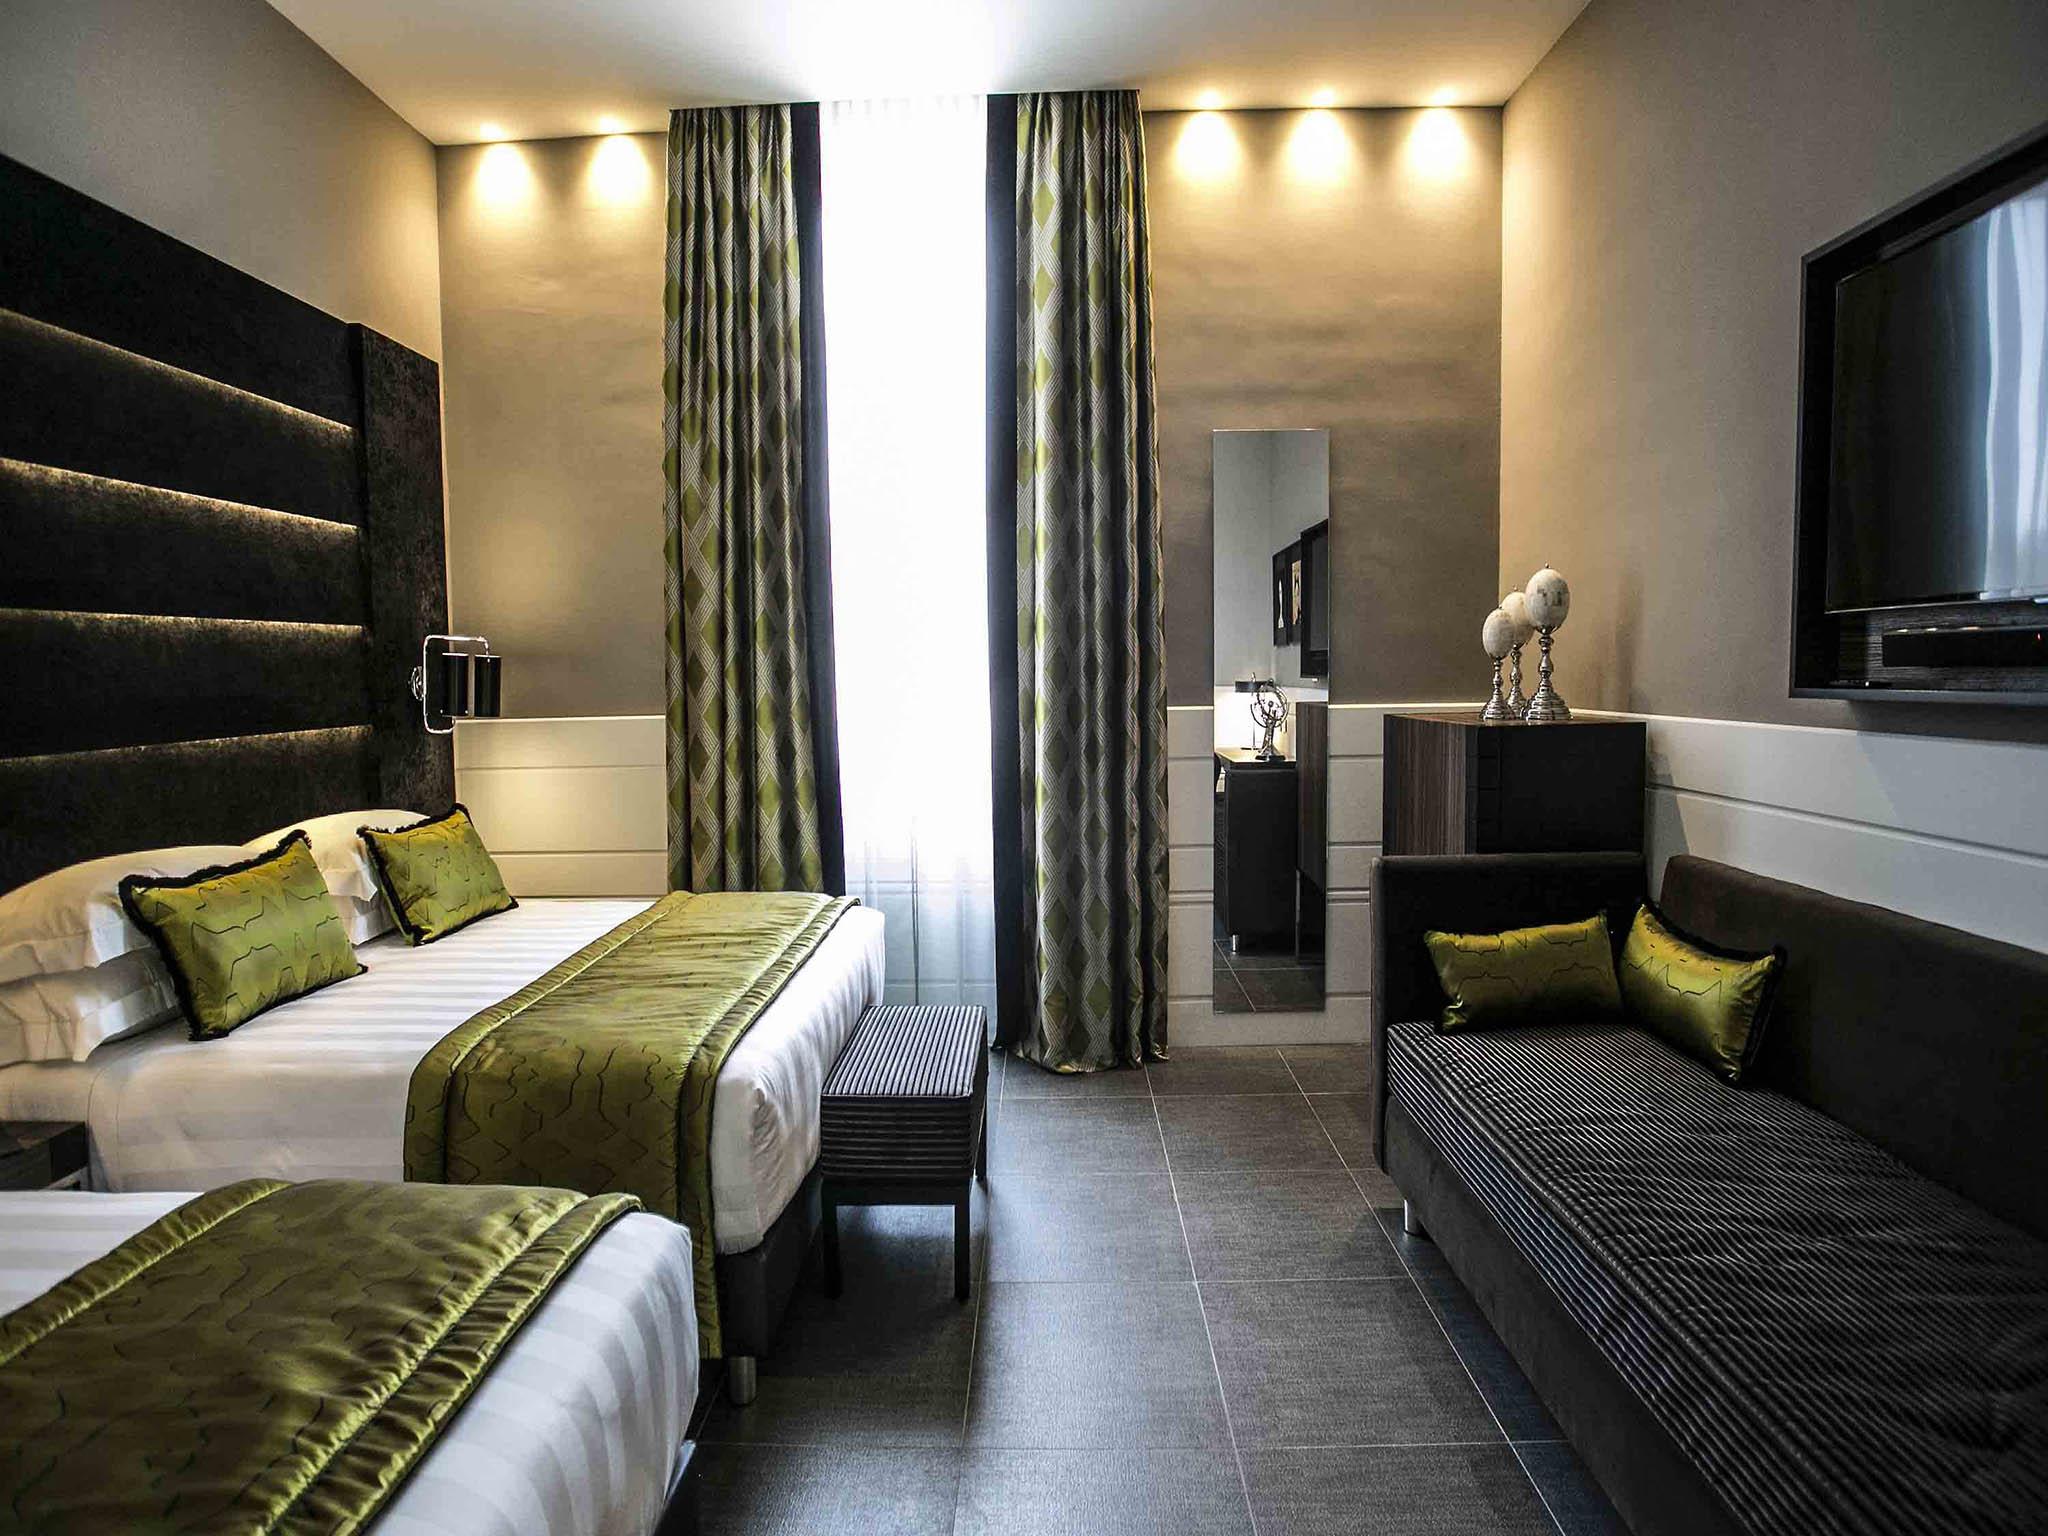 Hotel in ROME Rome Glam Hotel